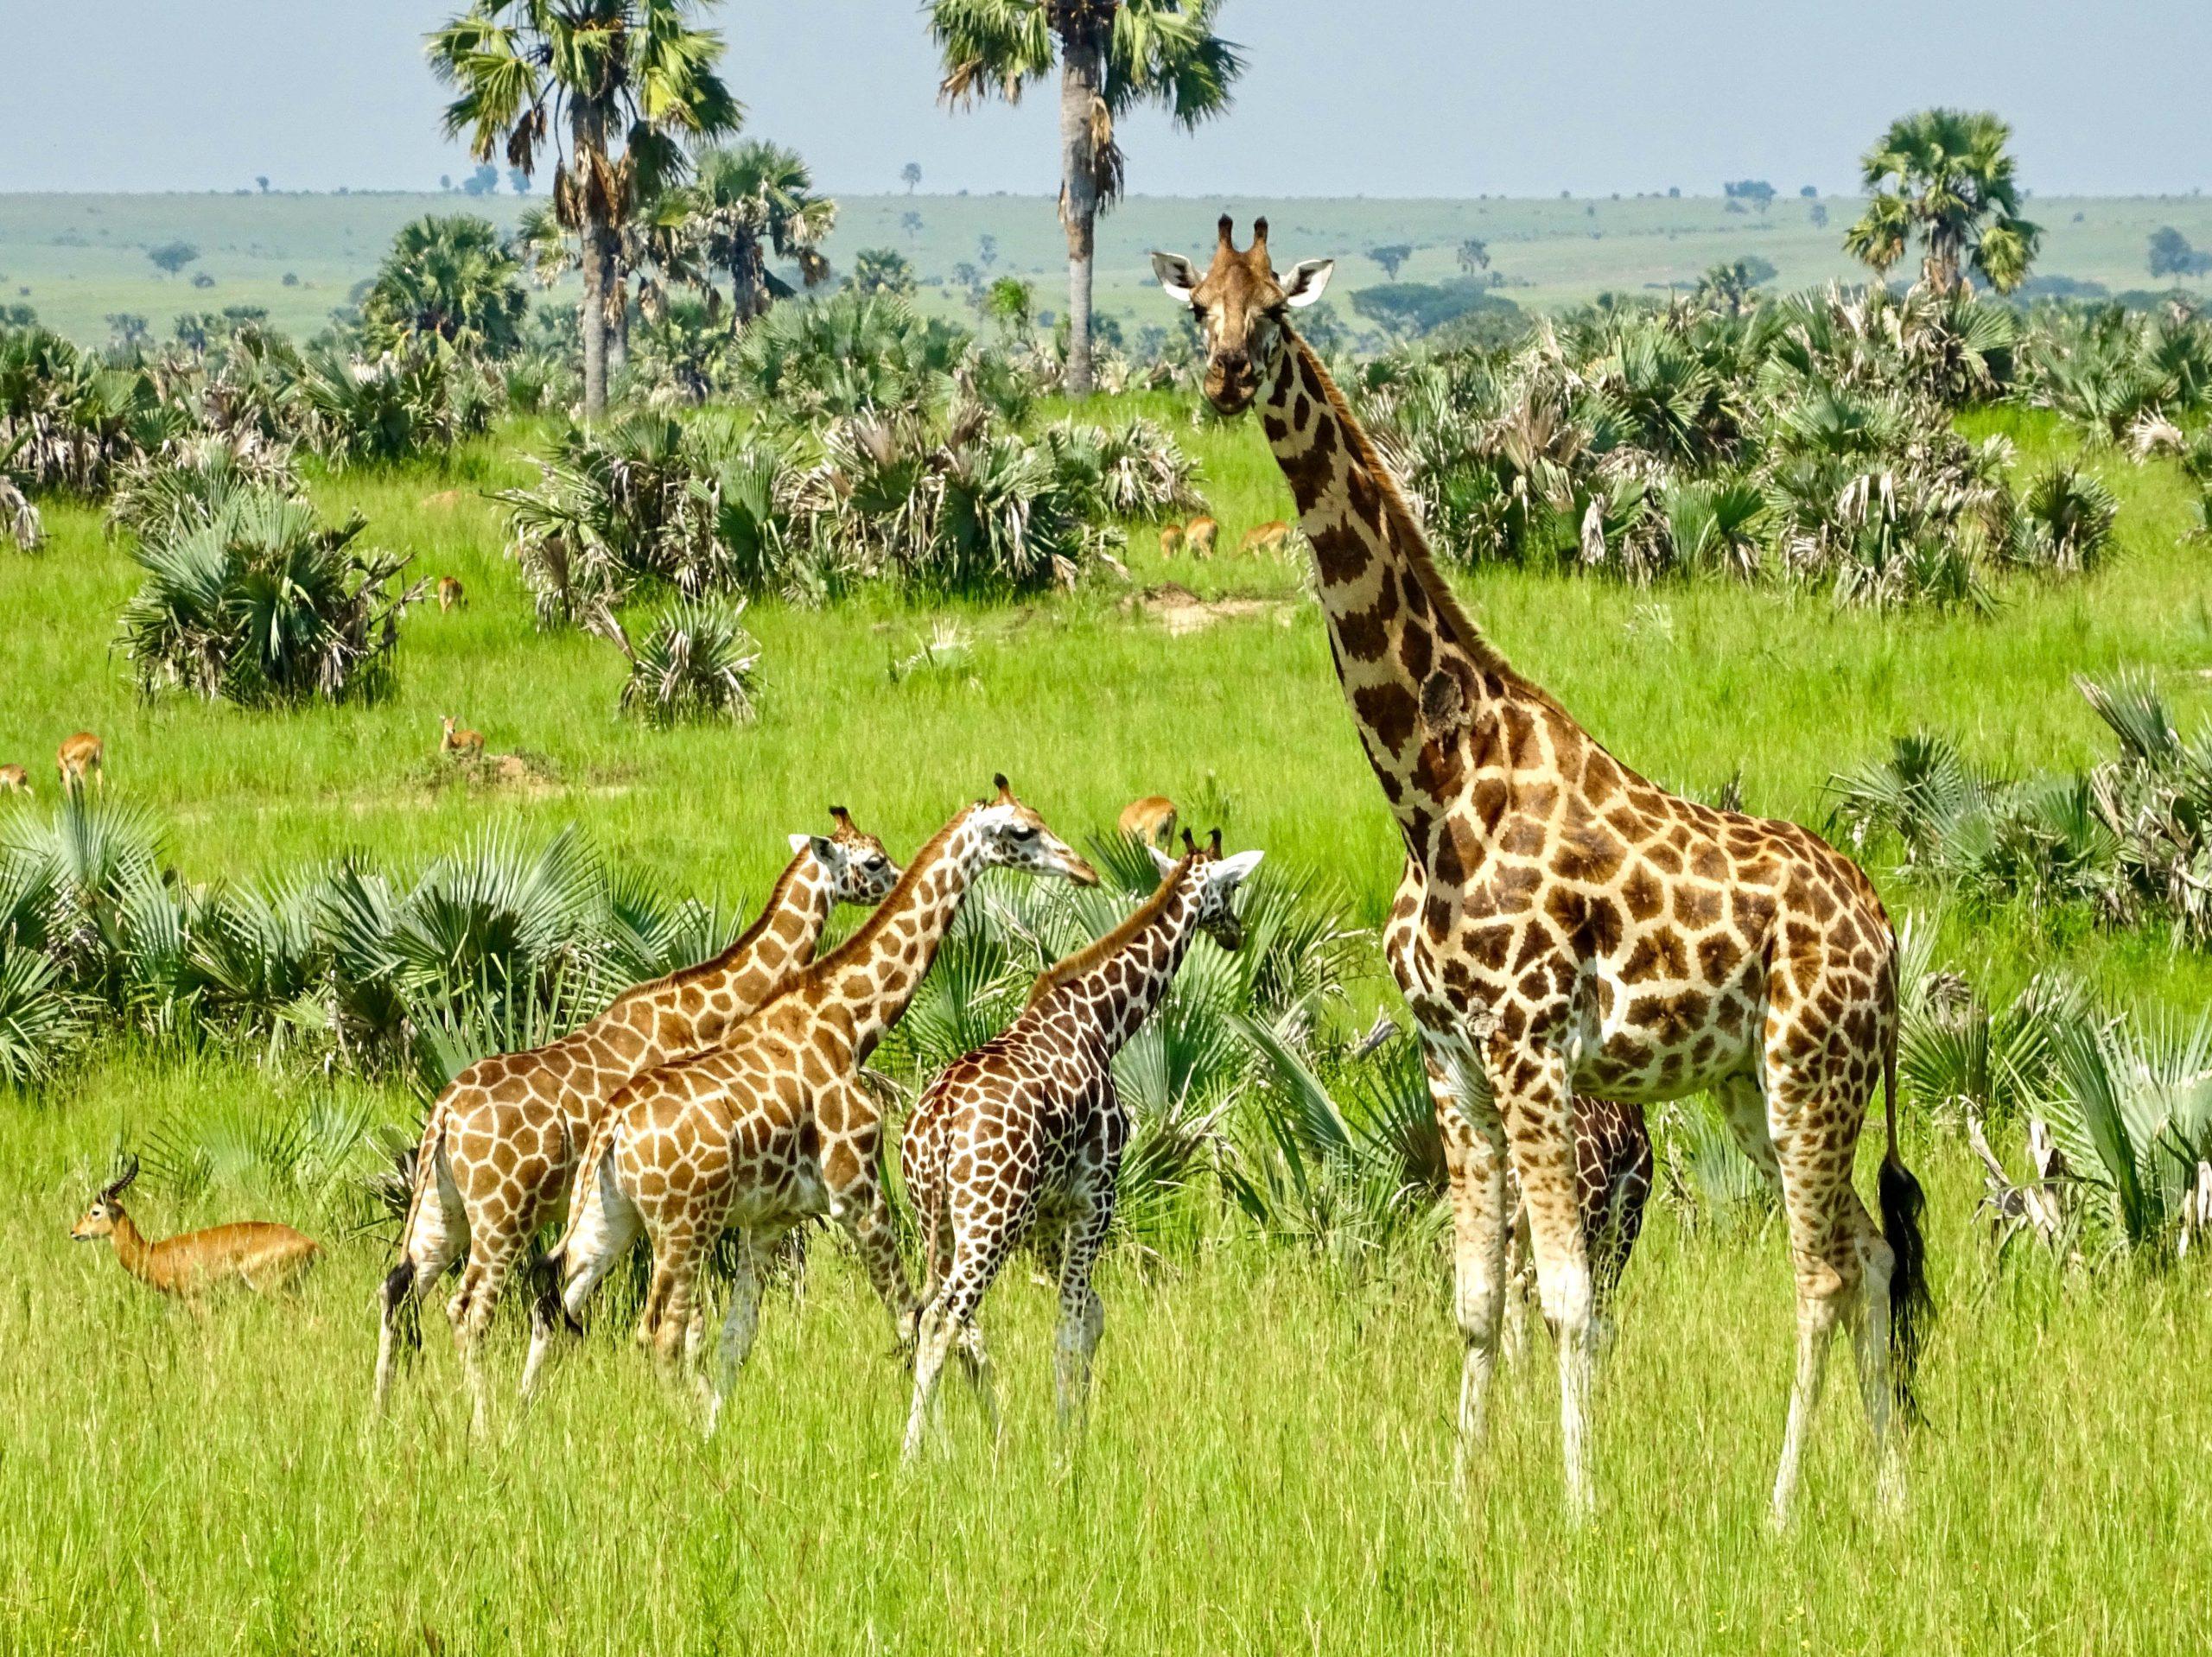 Rotschild giraffes in Murchison Falls National Park